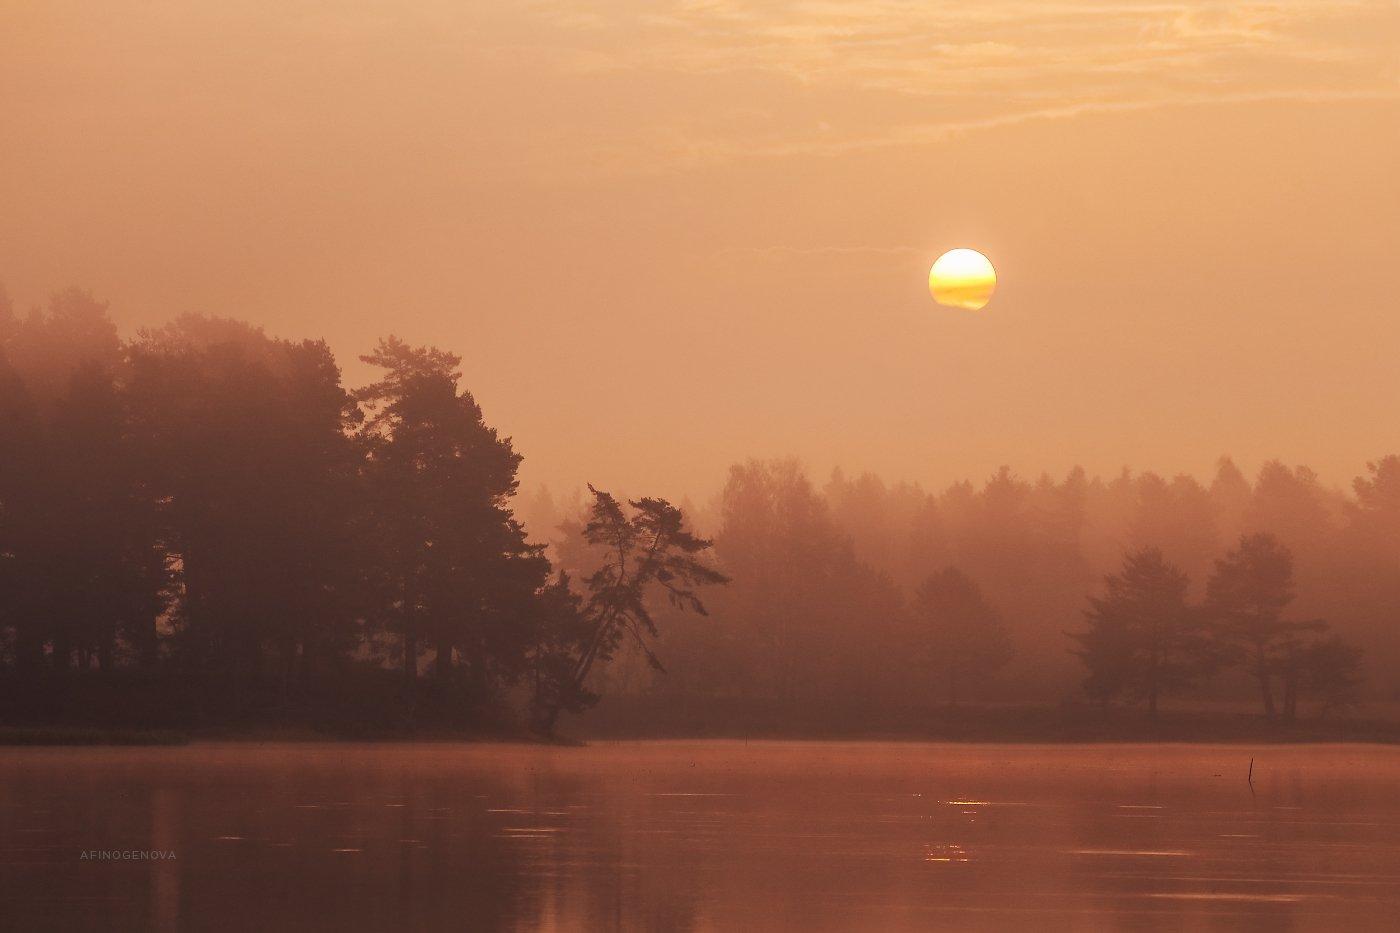 утро солнце рассвет лес, Афиногенова Татьяна